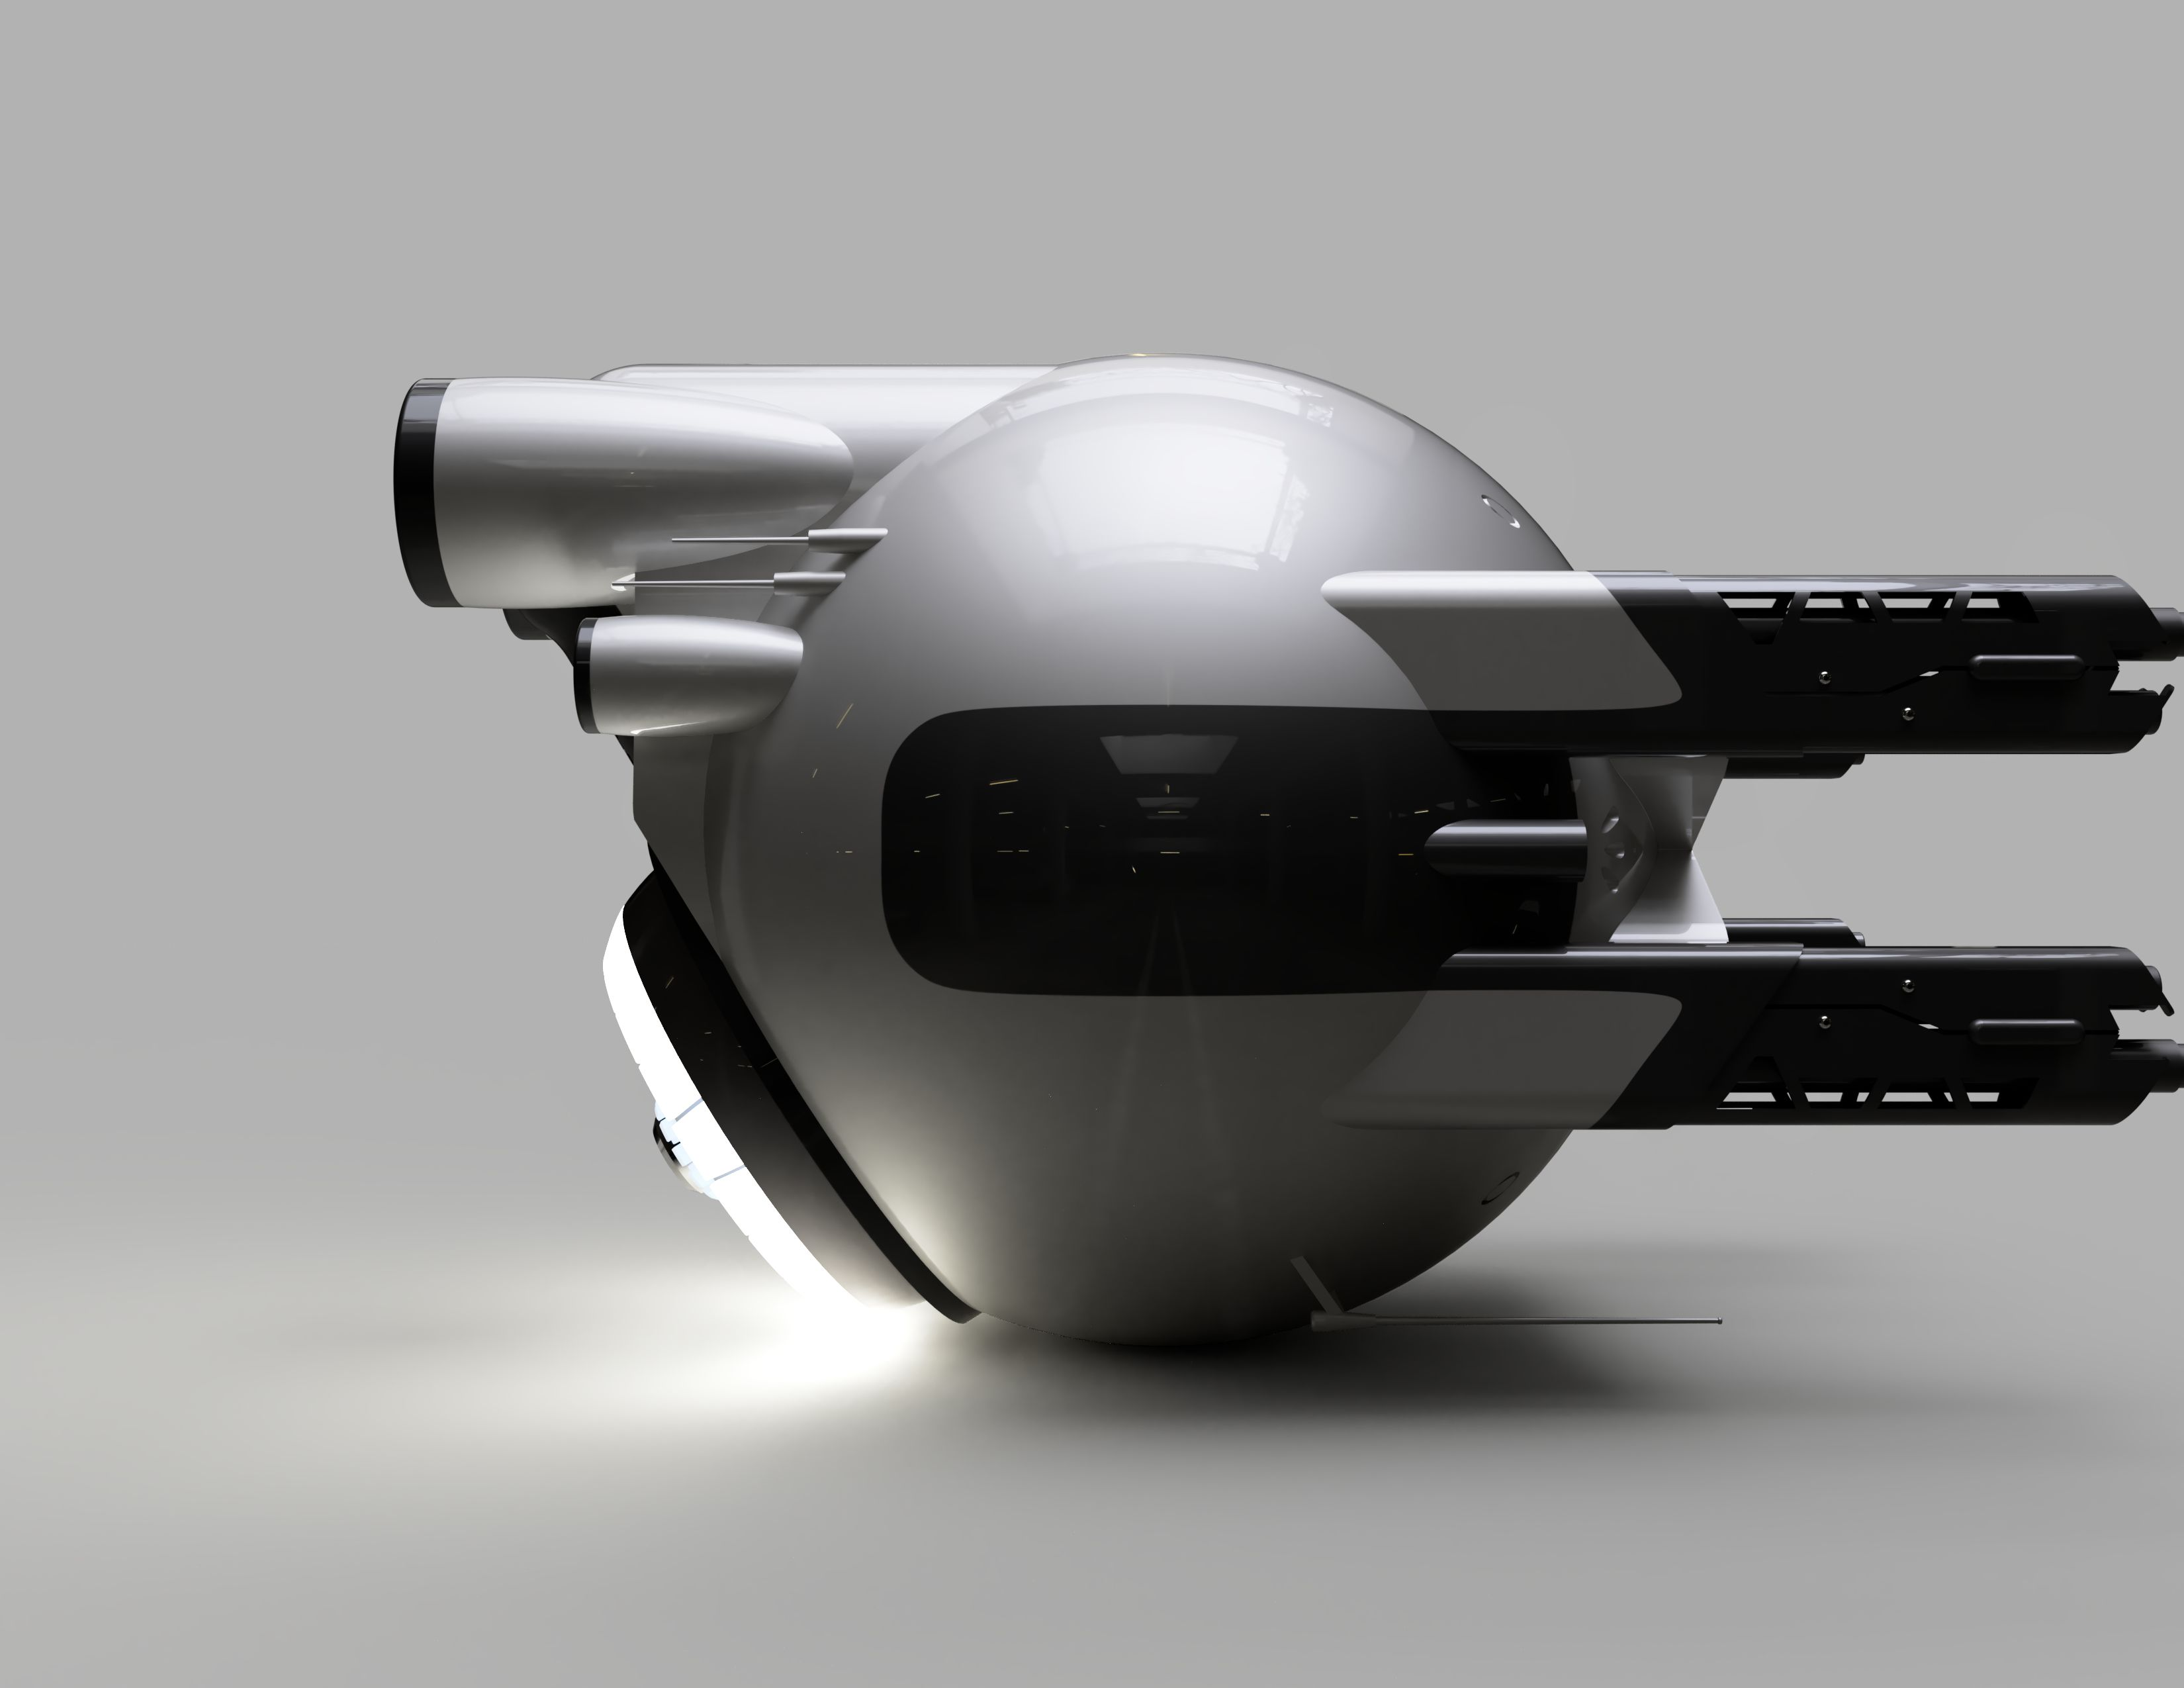 Dron-con-acabado-2019-dec-14-02-54-13am-000-customizedview9032899262-png-3500-3500